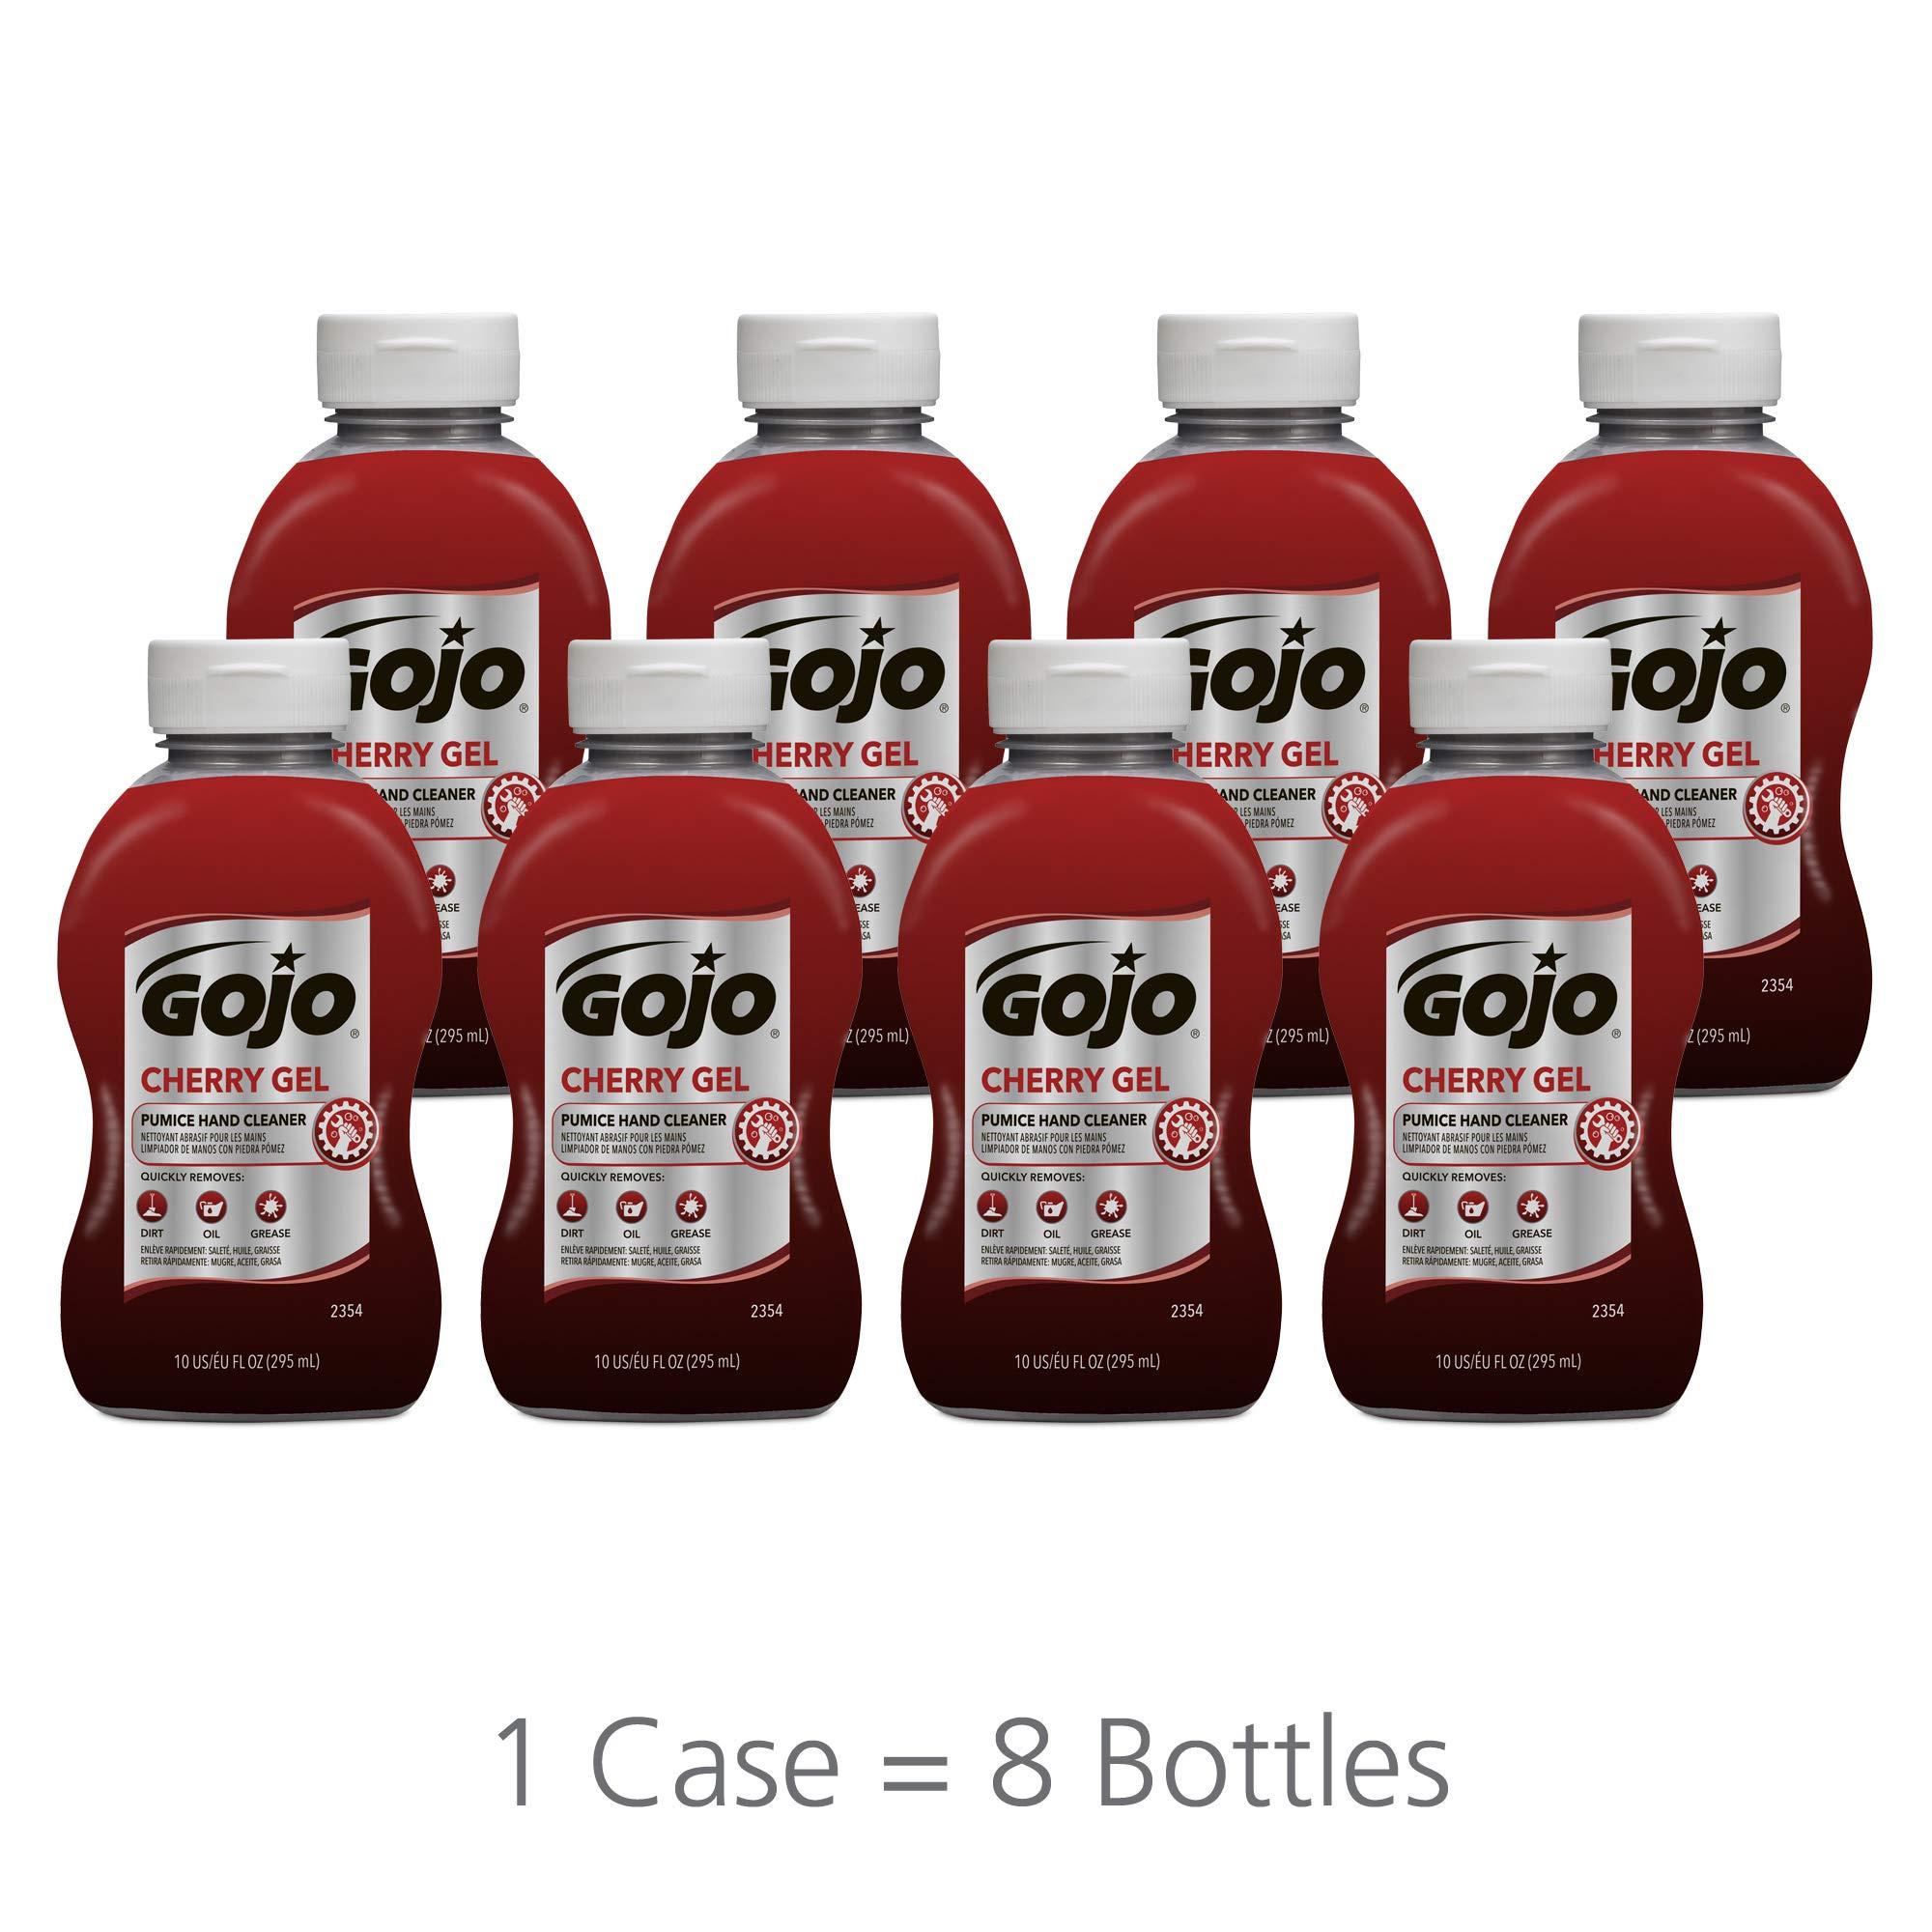 GOJO 235408 Cherry Gel Pumice Hand Cleaner, 10 oz Bottle (Case of 8)